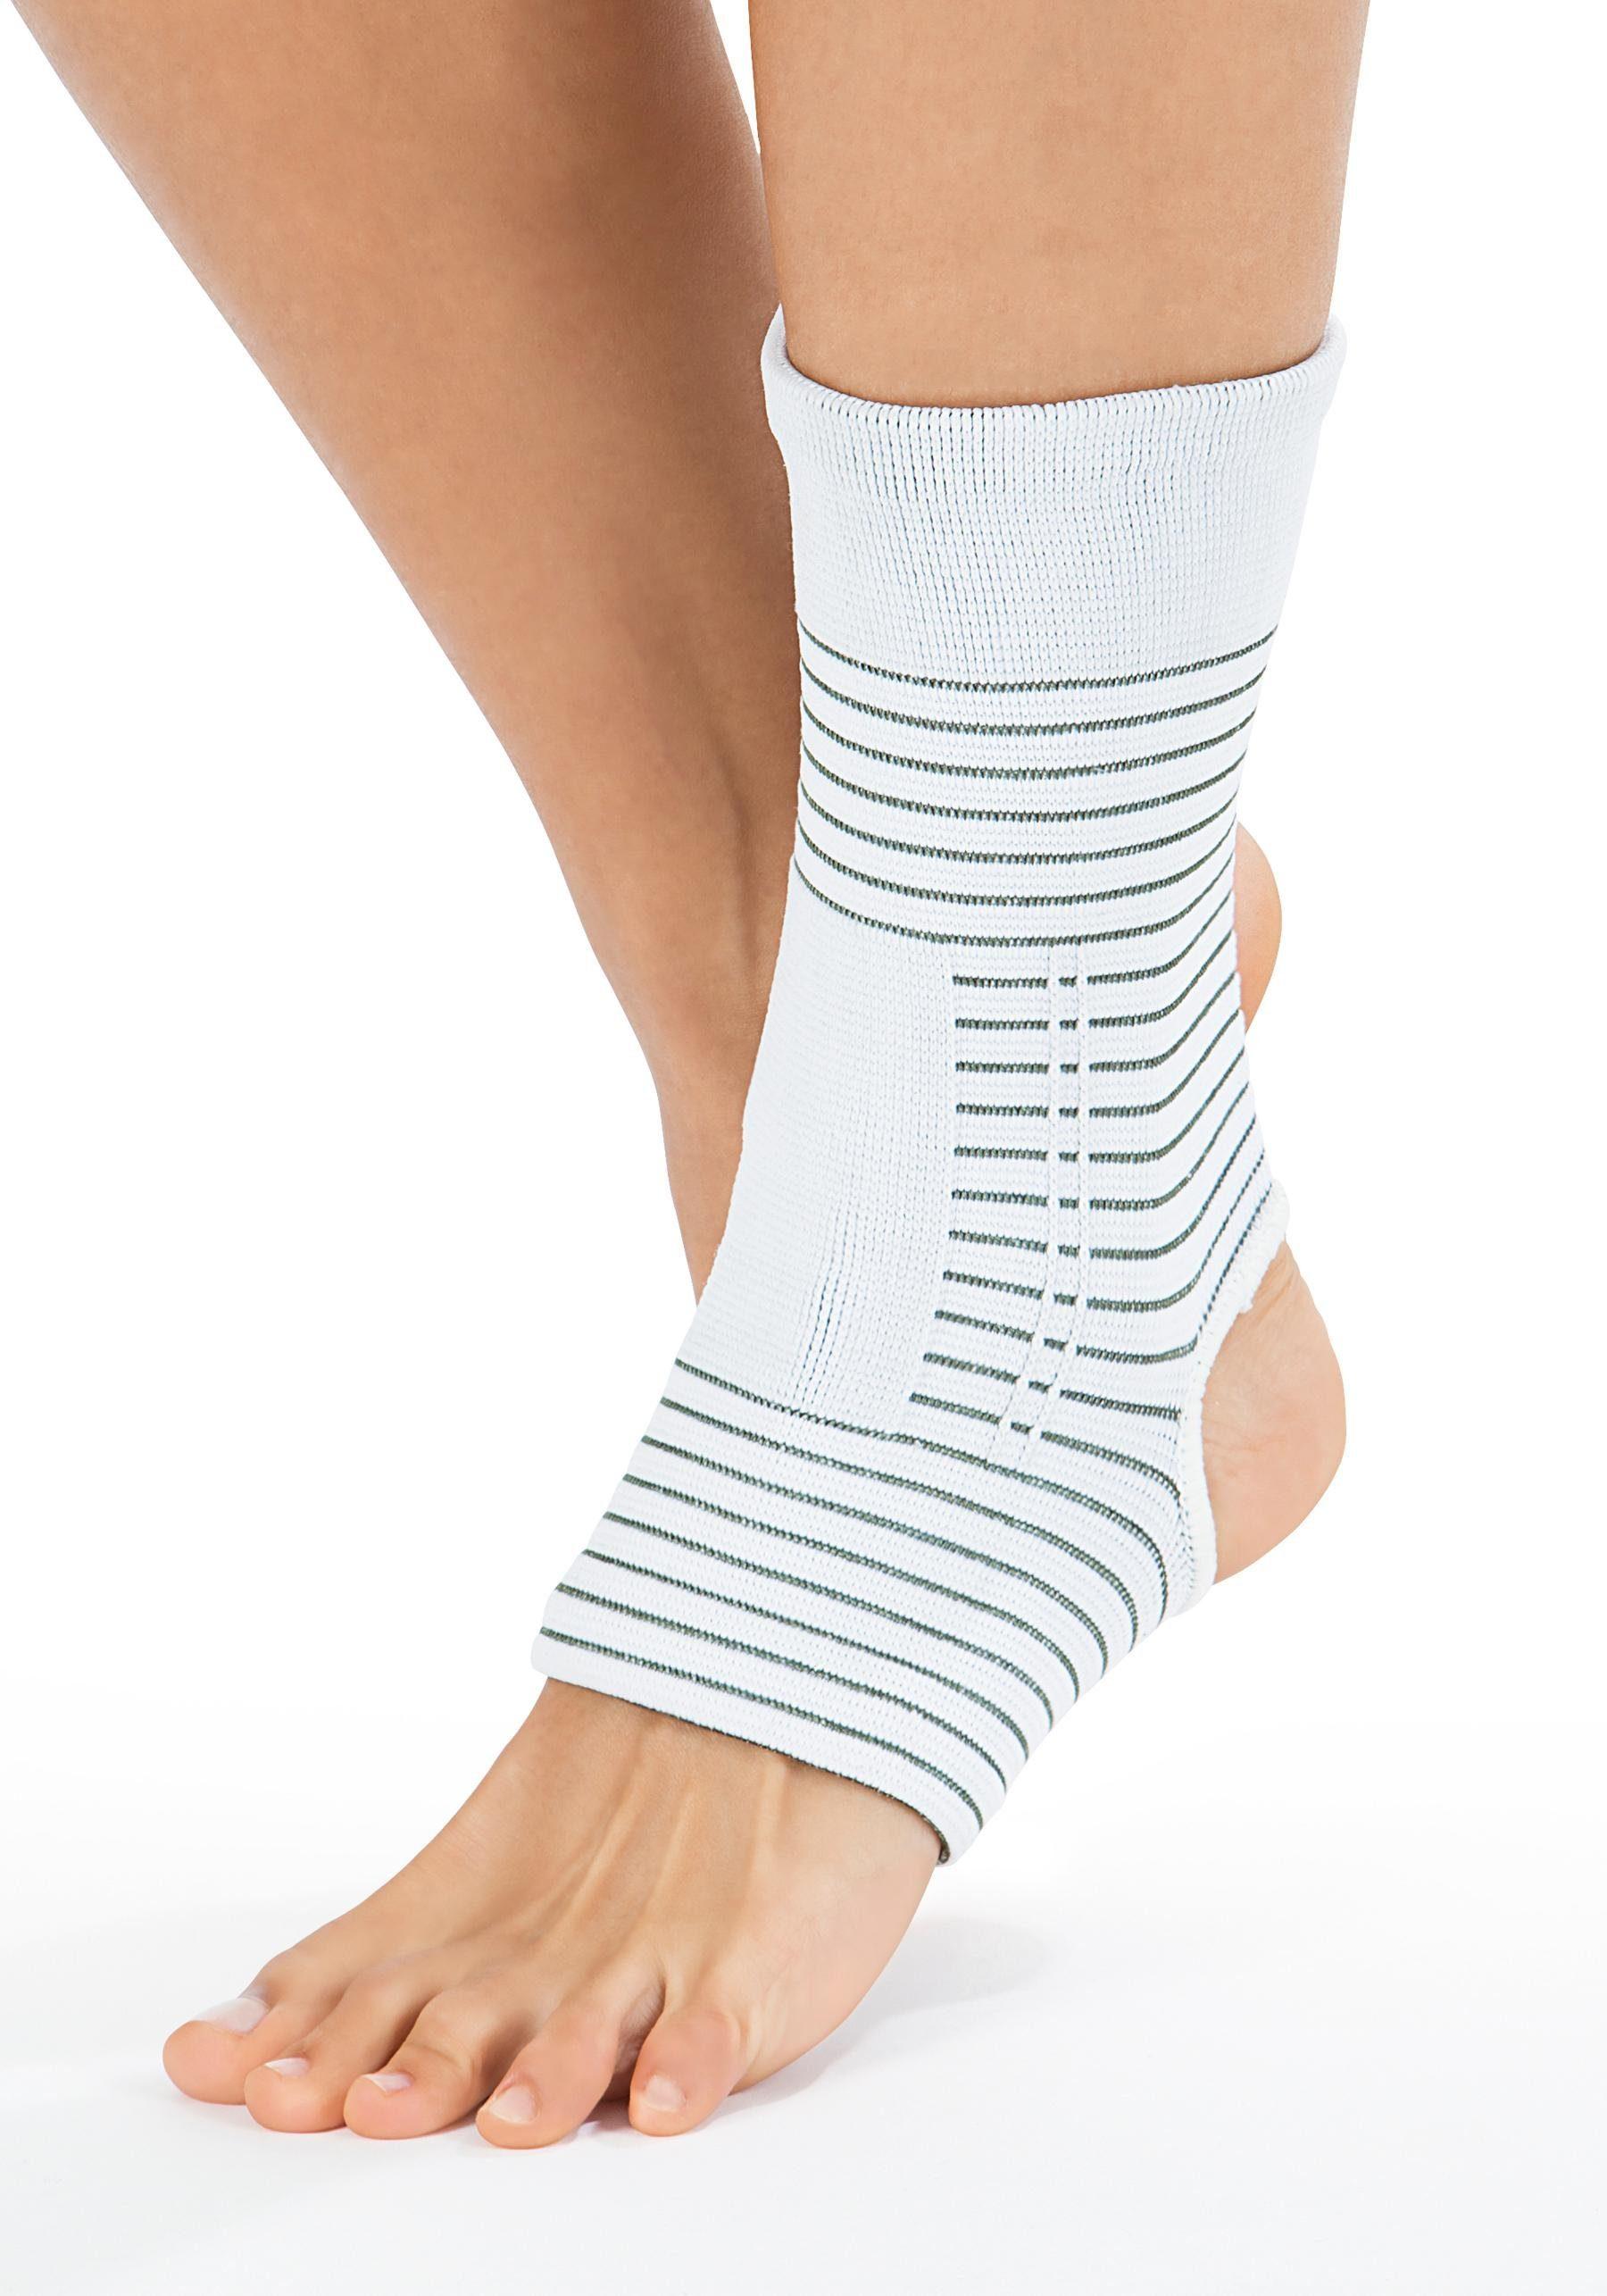 VITALmaxx Fußbandage, mit Kupferfasern